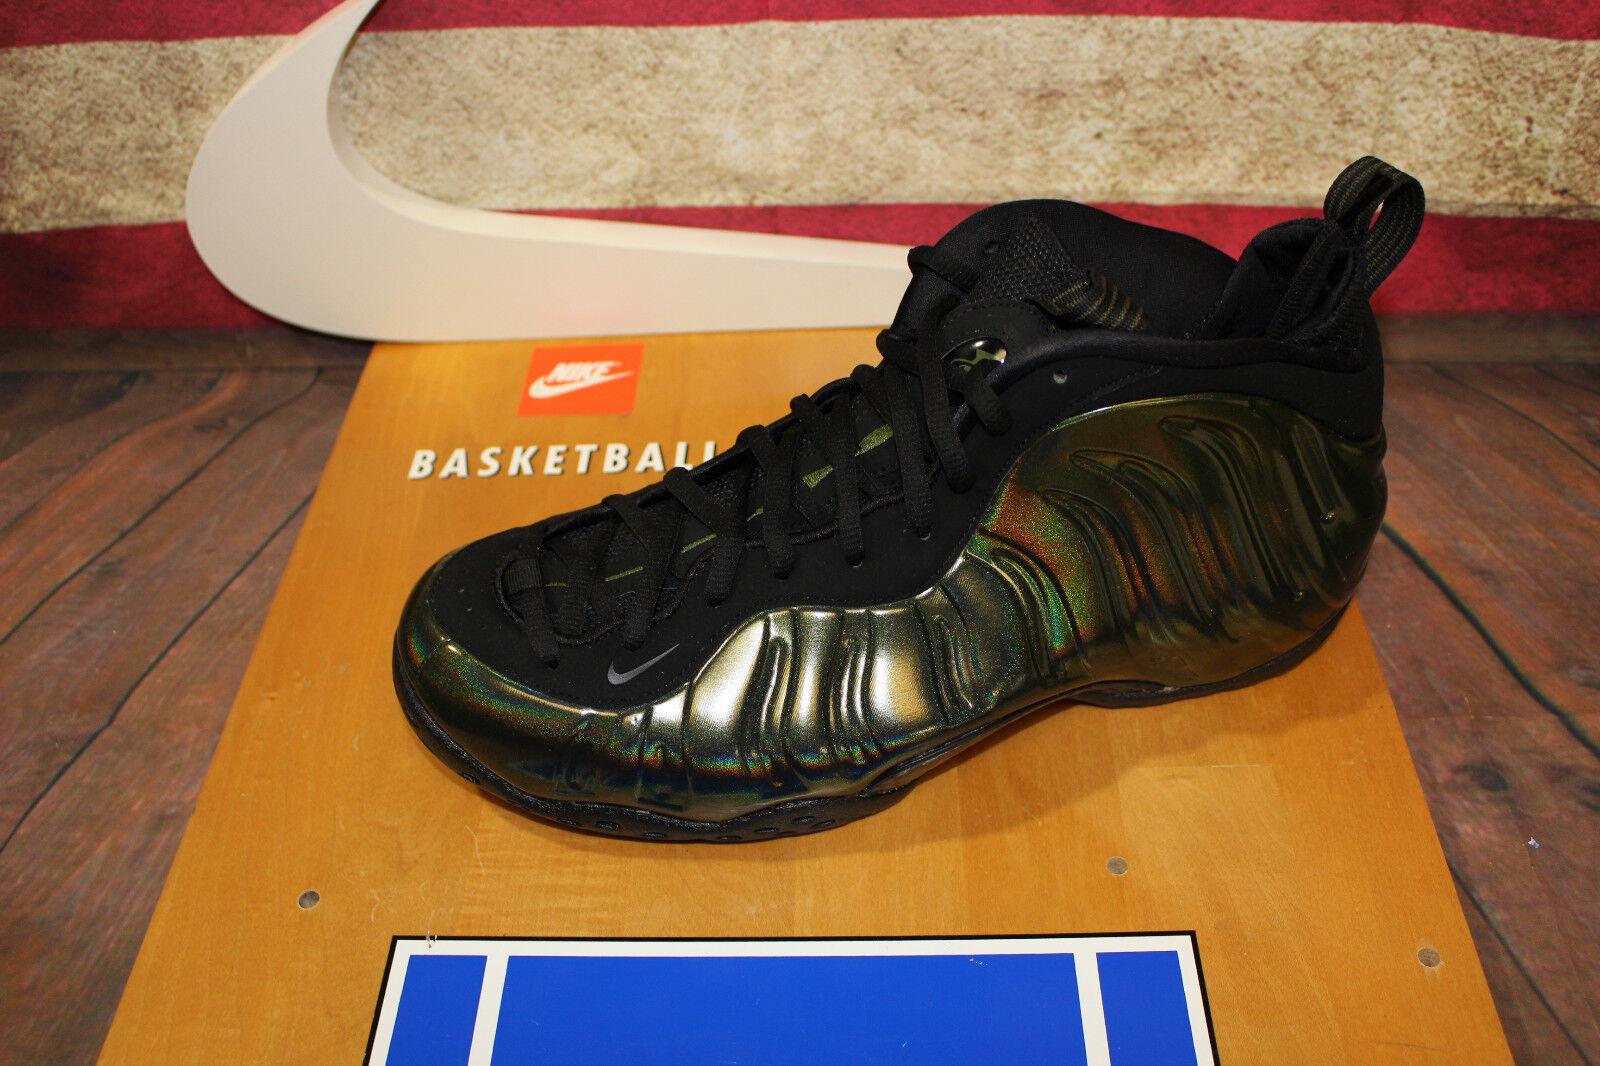 Nike Air Foamposite One Legion Green, 314996-301 Brand New Size 13